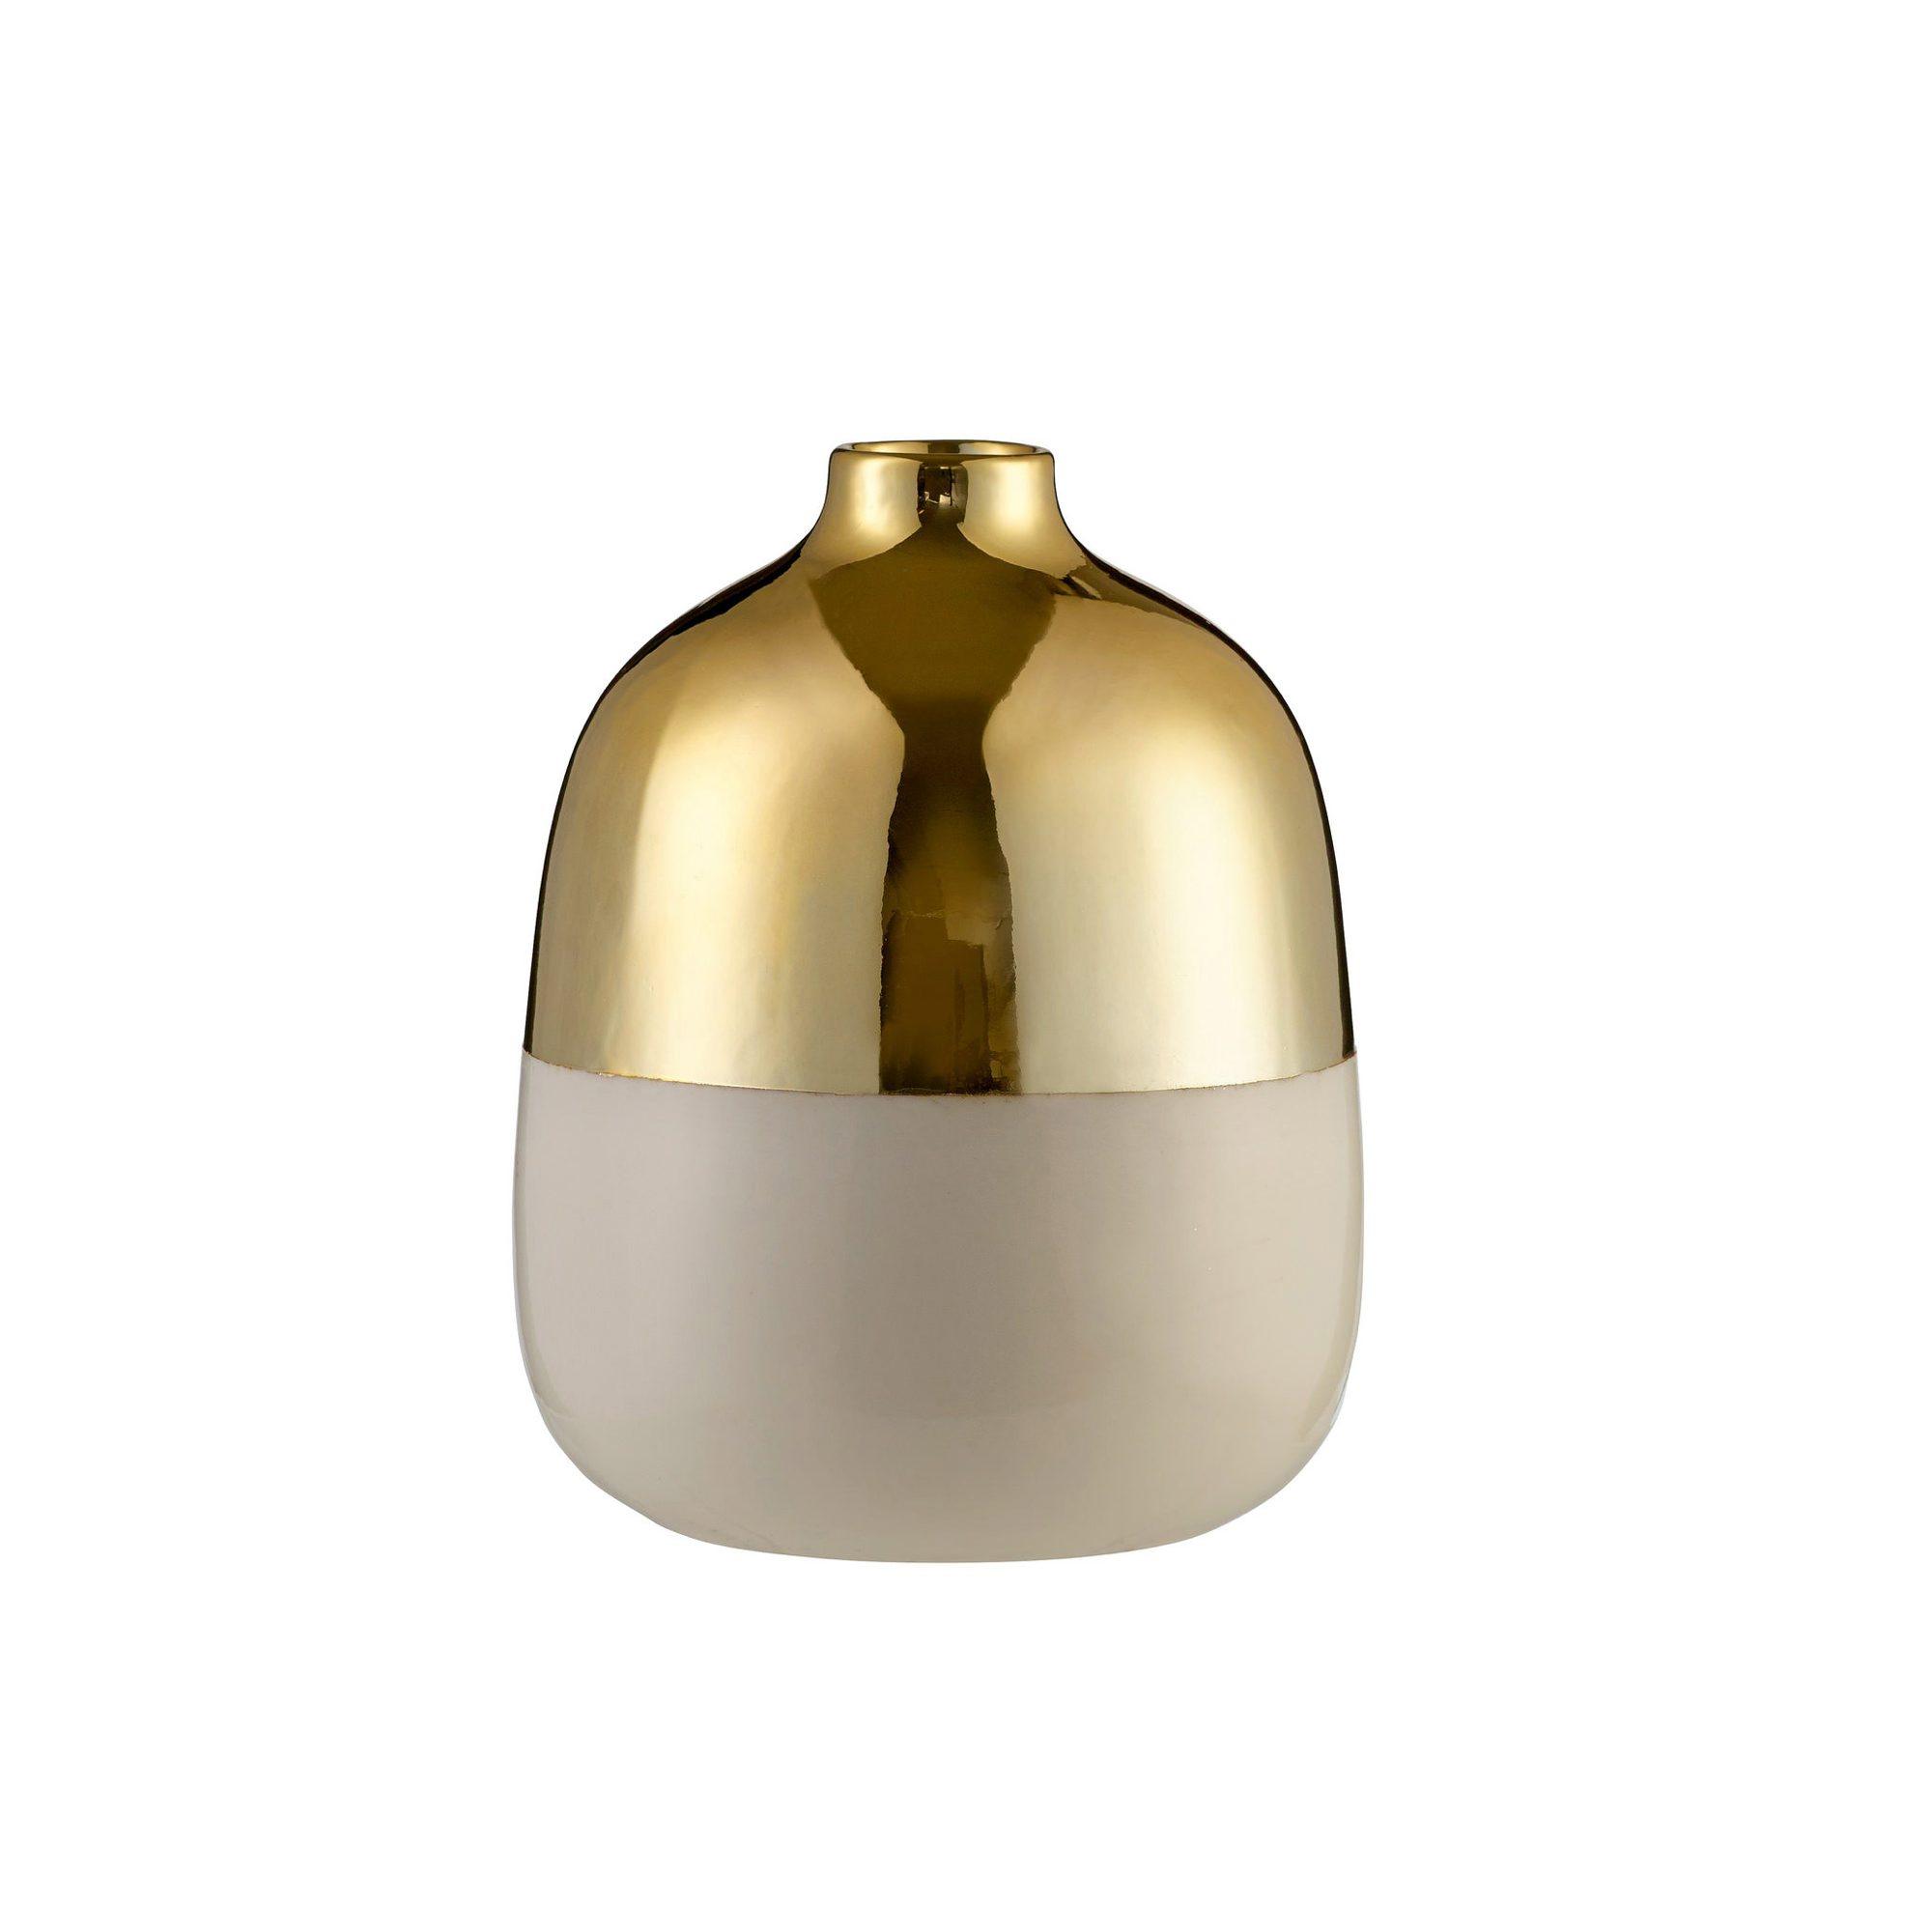 Vase, kr 199, Habitat.